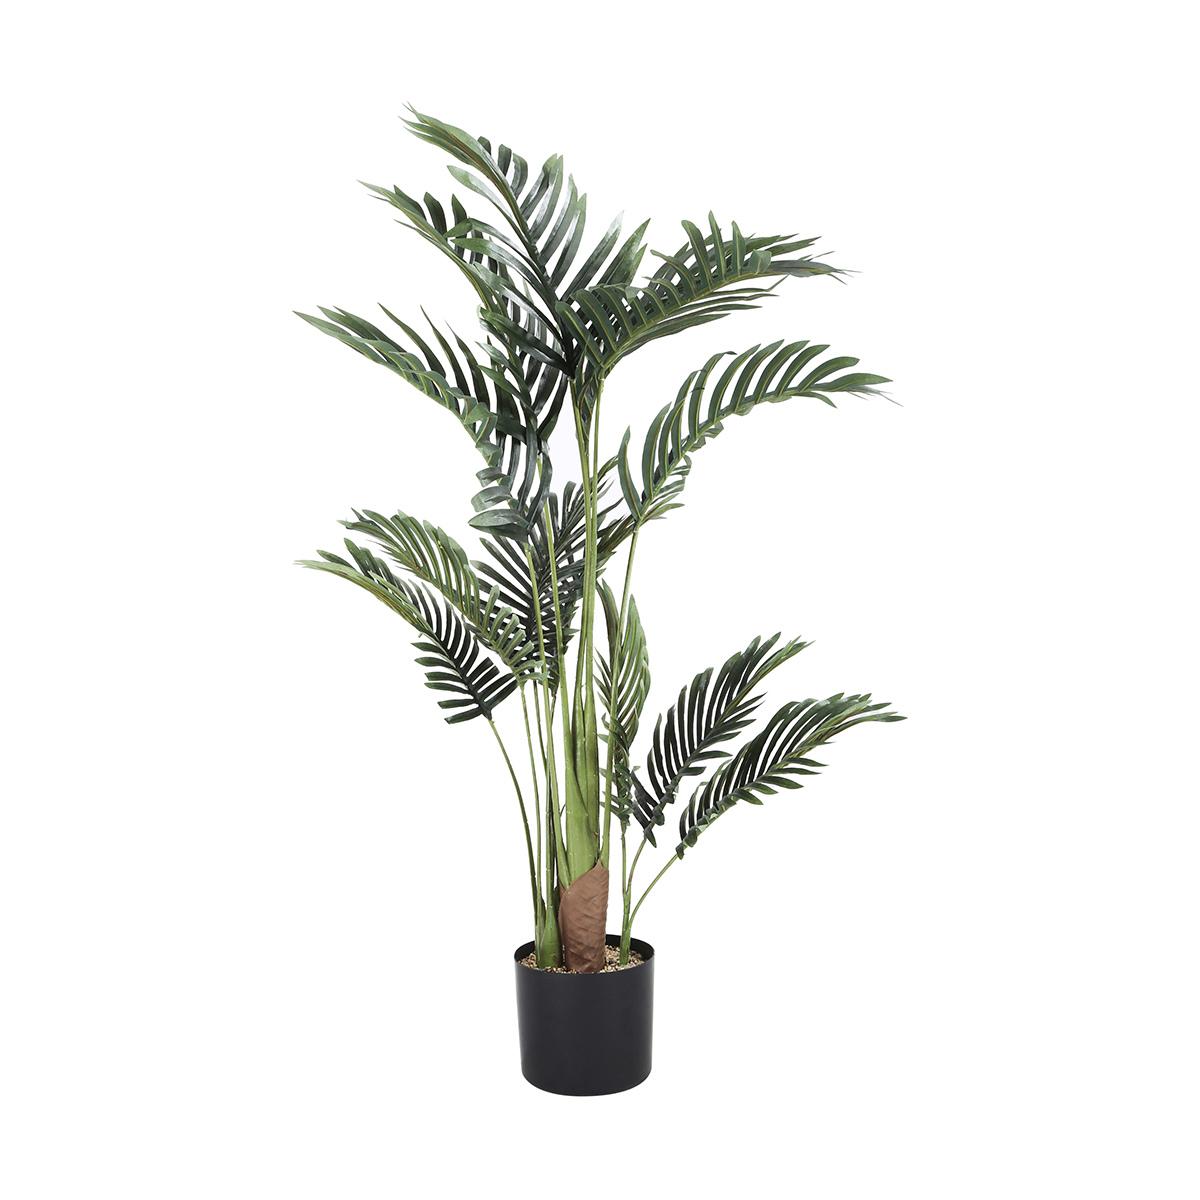 Tall Artificial Palm Tree | Kmart